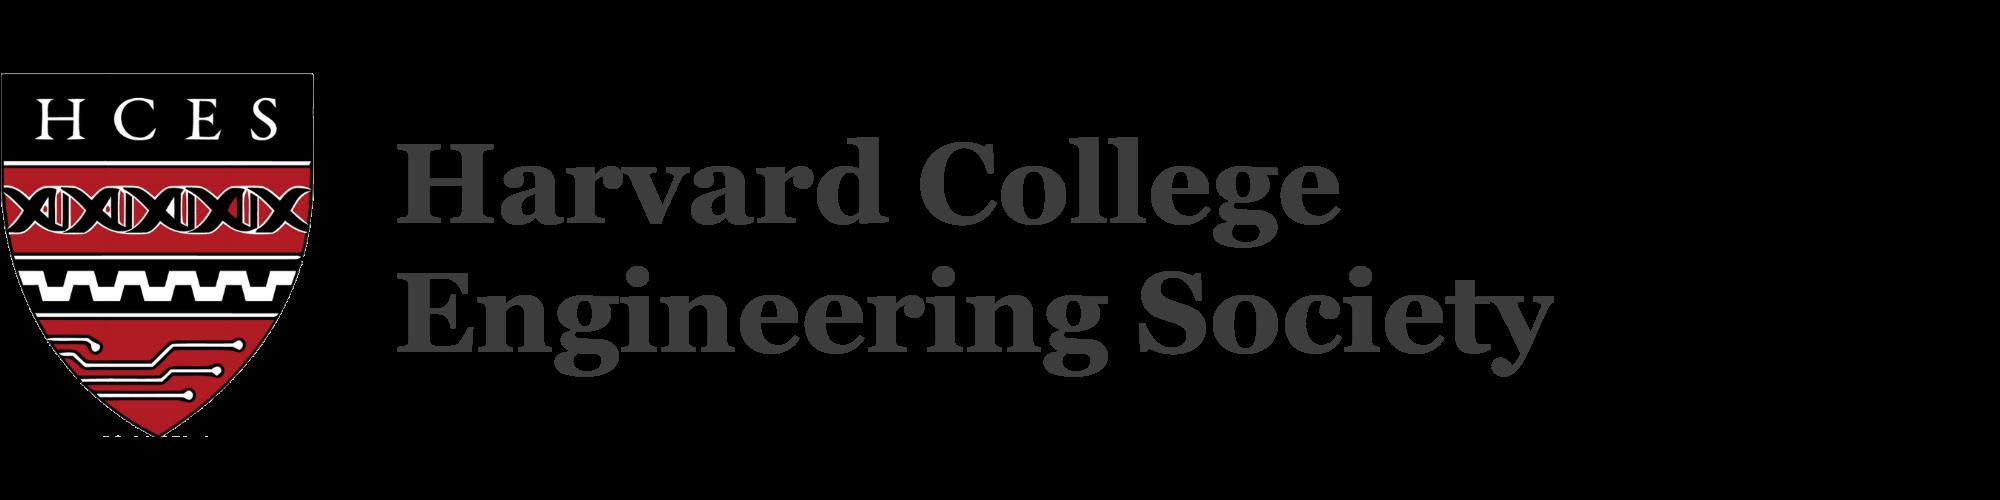 Harvard College Engineering Society